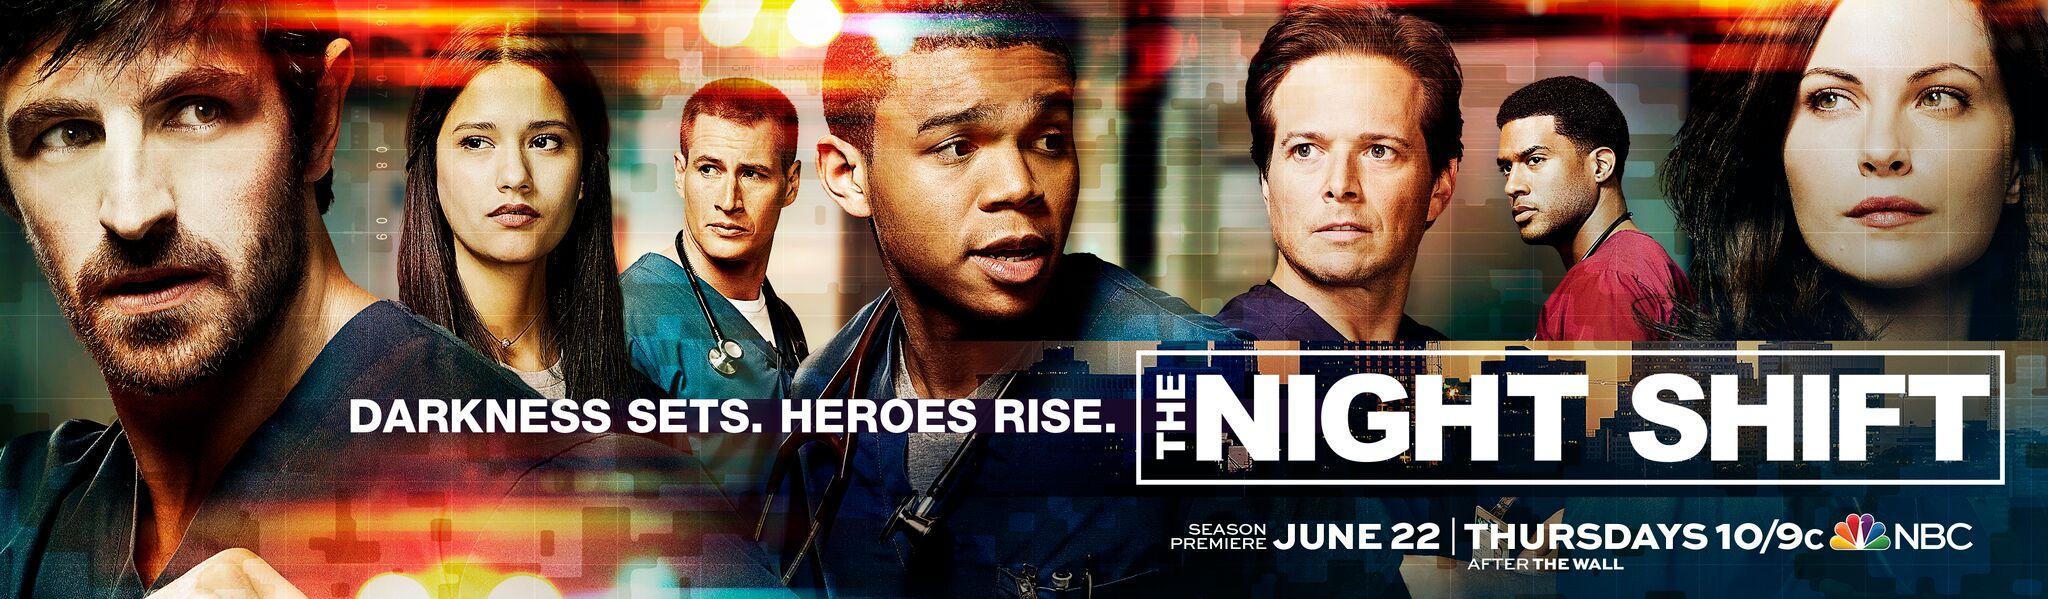 "Love Military Storytelling? Watch NBC's ""The Night Shift"""